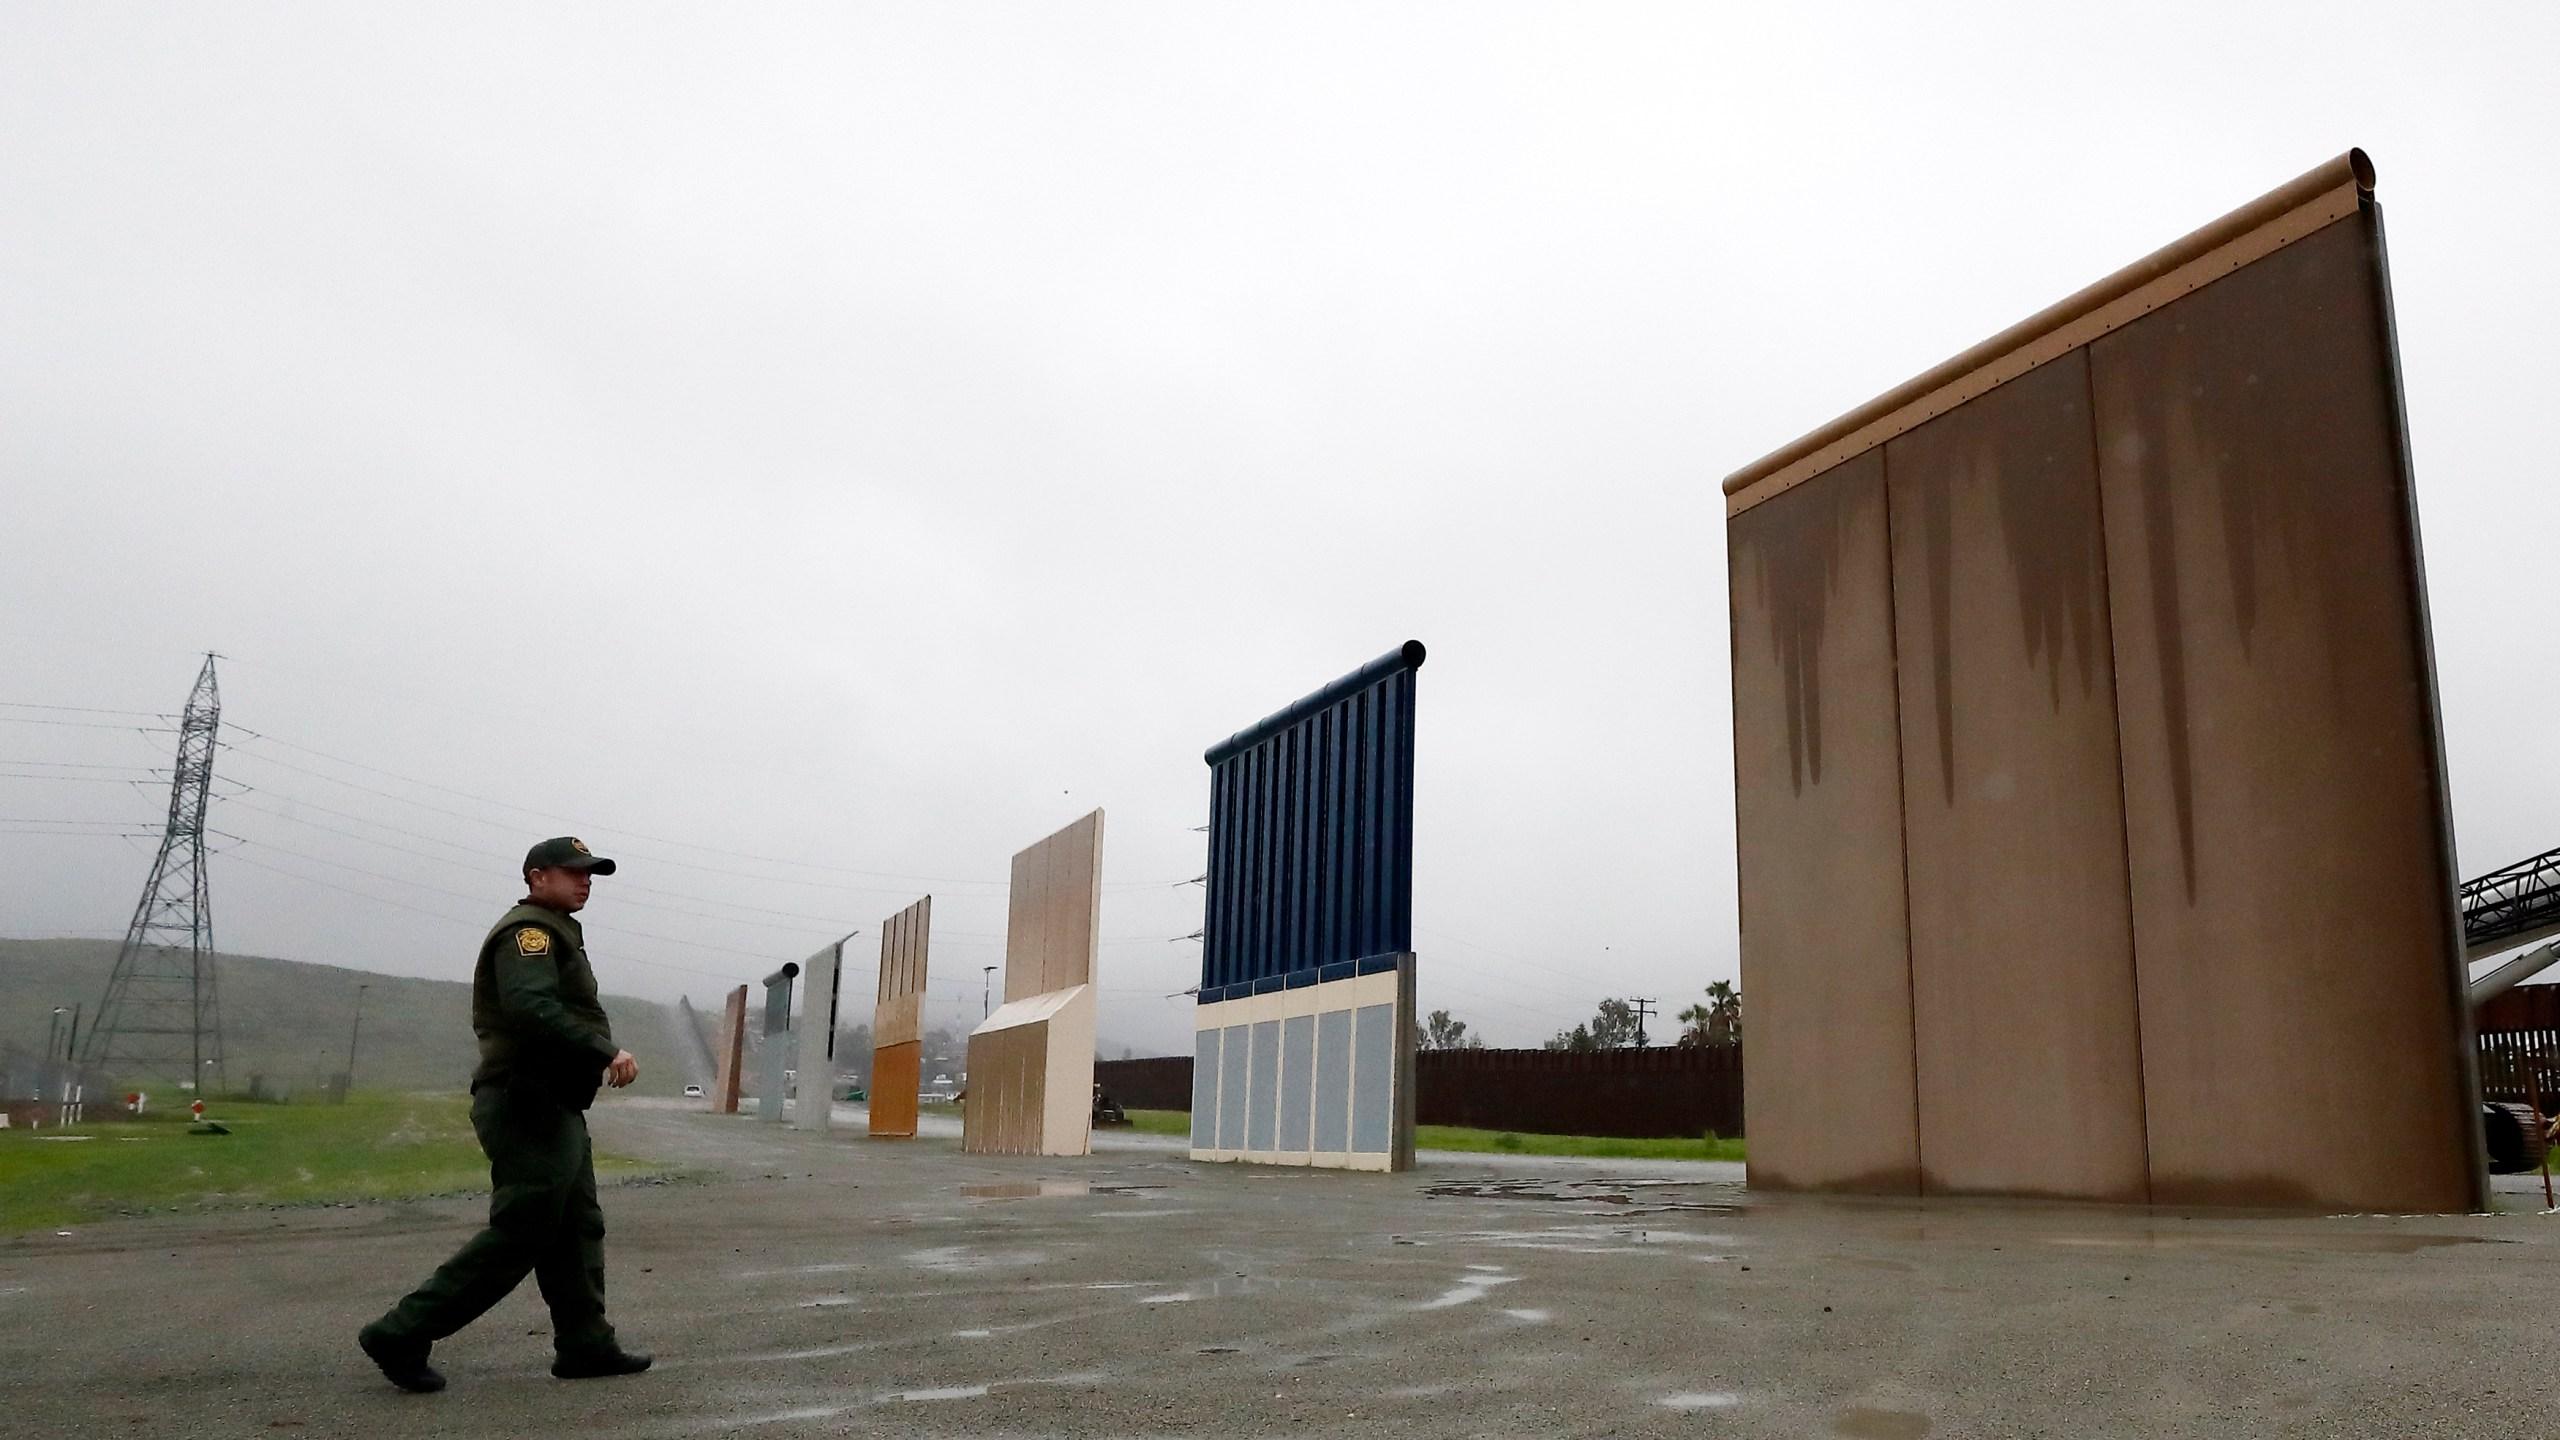 Border_Wall_Prototype_37134-159532.jpg73953548